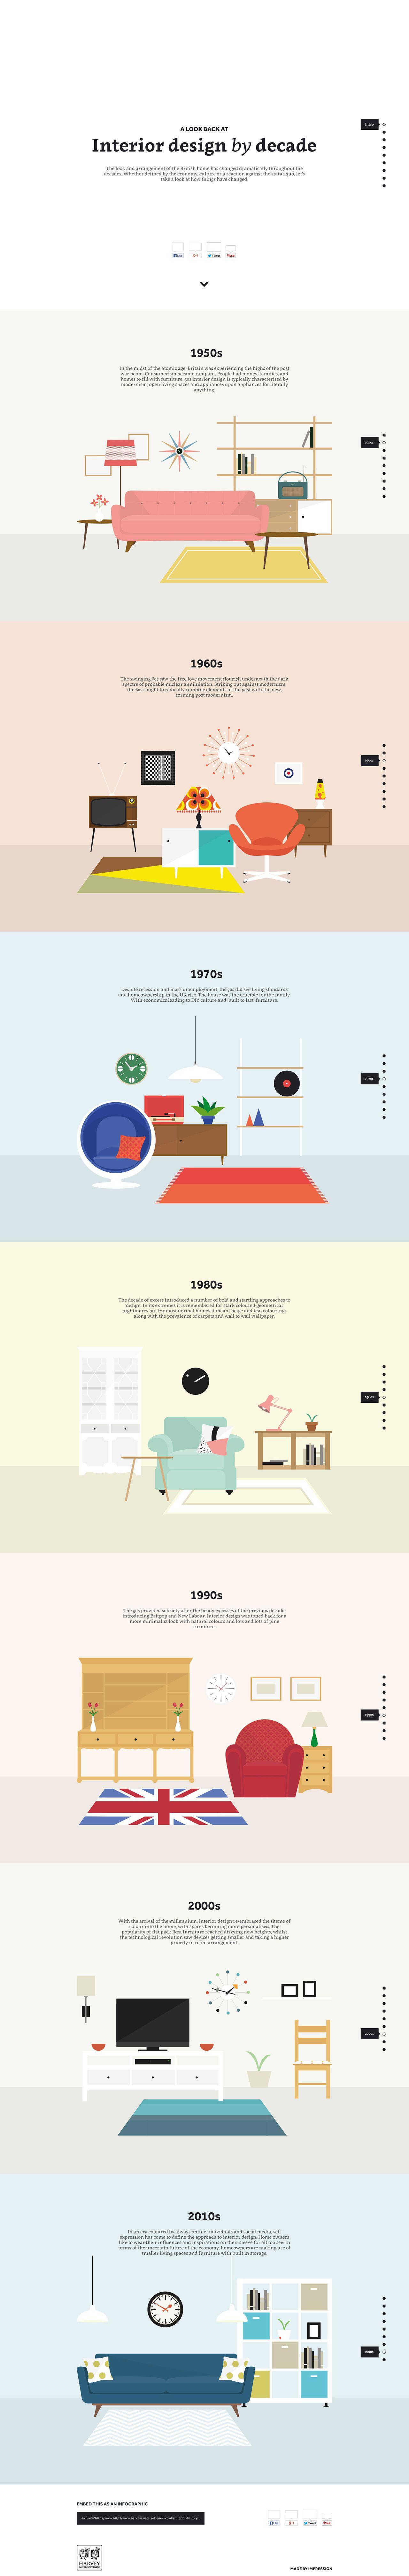 Interior Design By Decade Infographic Design Interior Design Tips Infographic